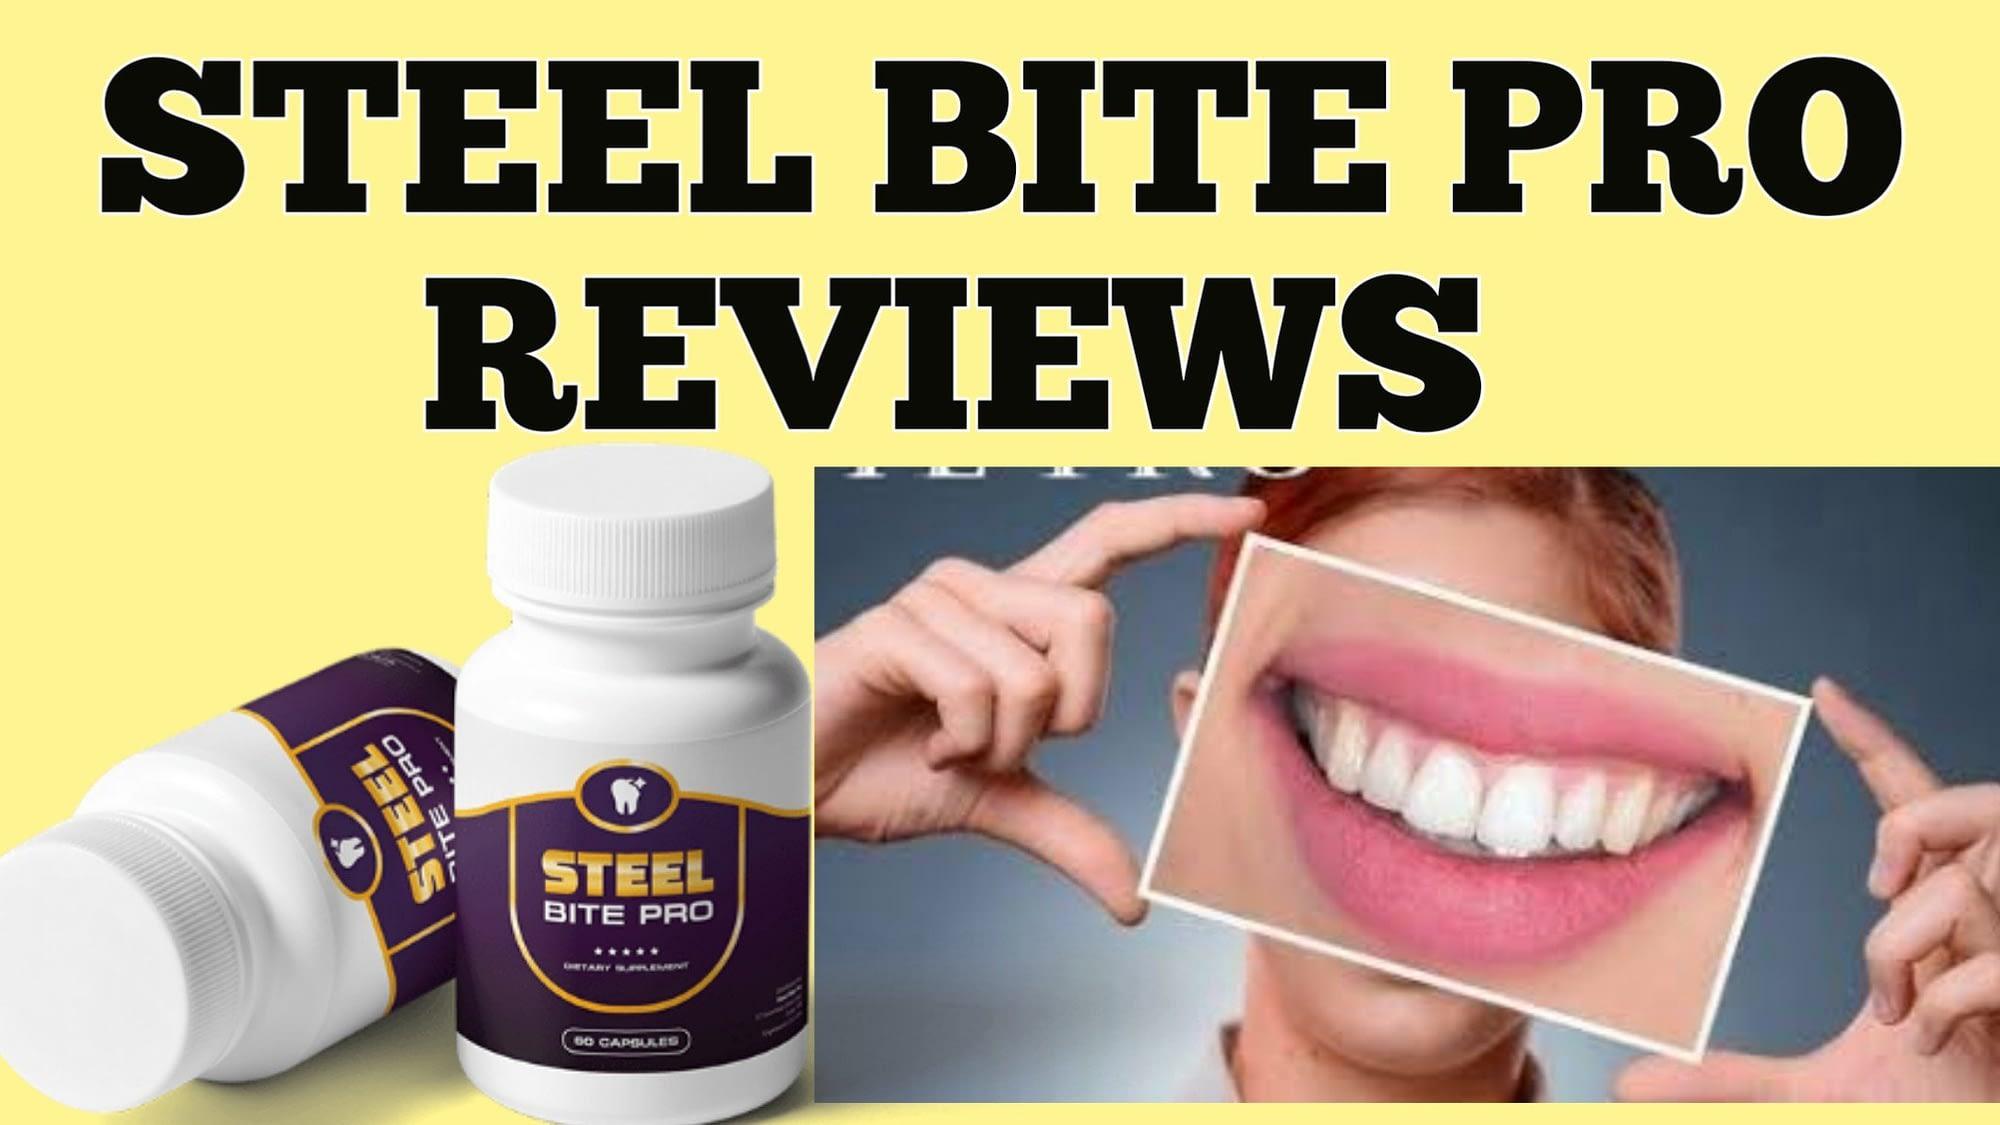 Read Honest Customer Steel Bite Pro Reviews